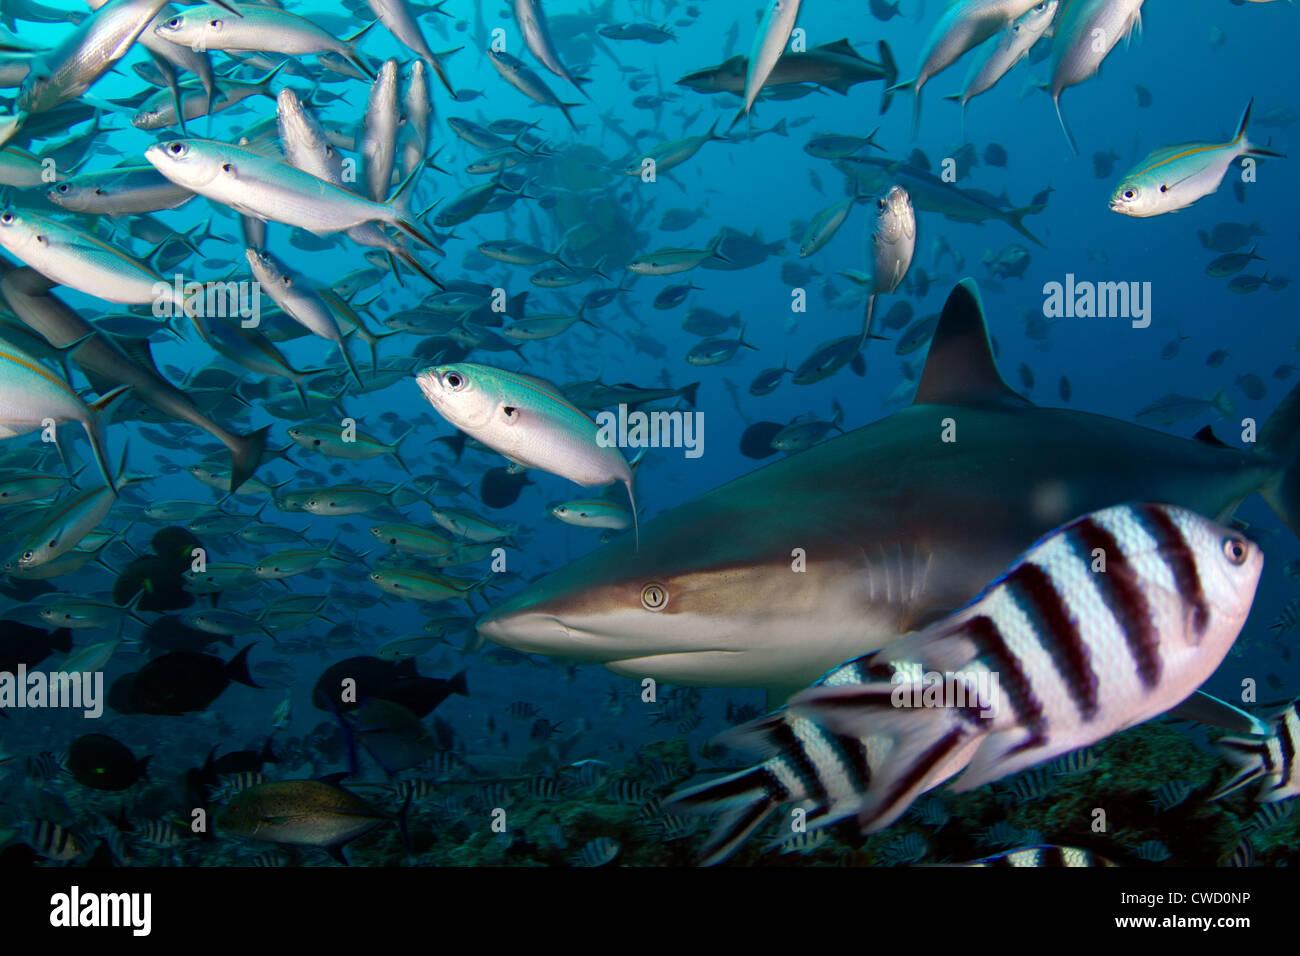 Silvertip shark Carcharhinus albimarginatus close-up in the Beqa lagoon, Fiji, South pacific - Stock Image